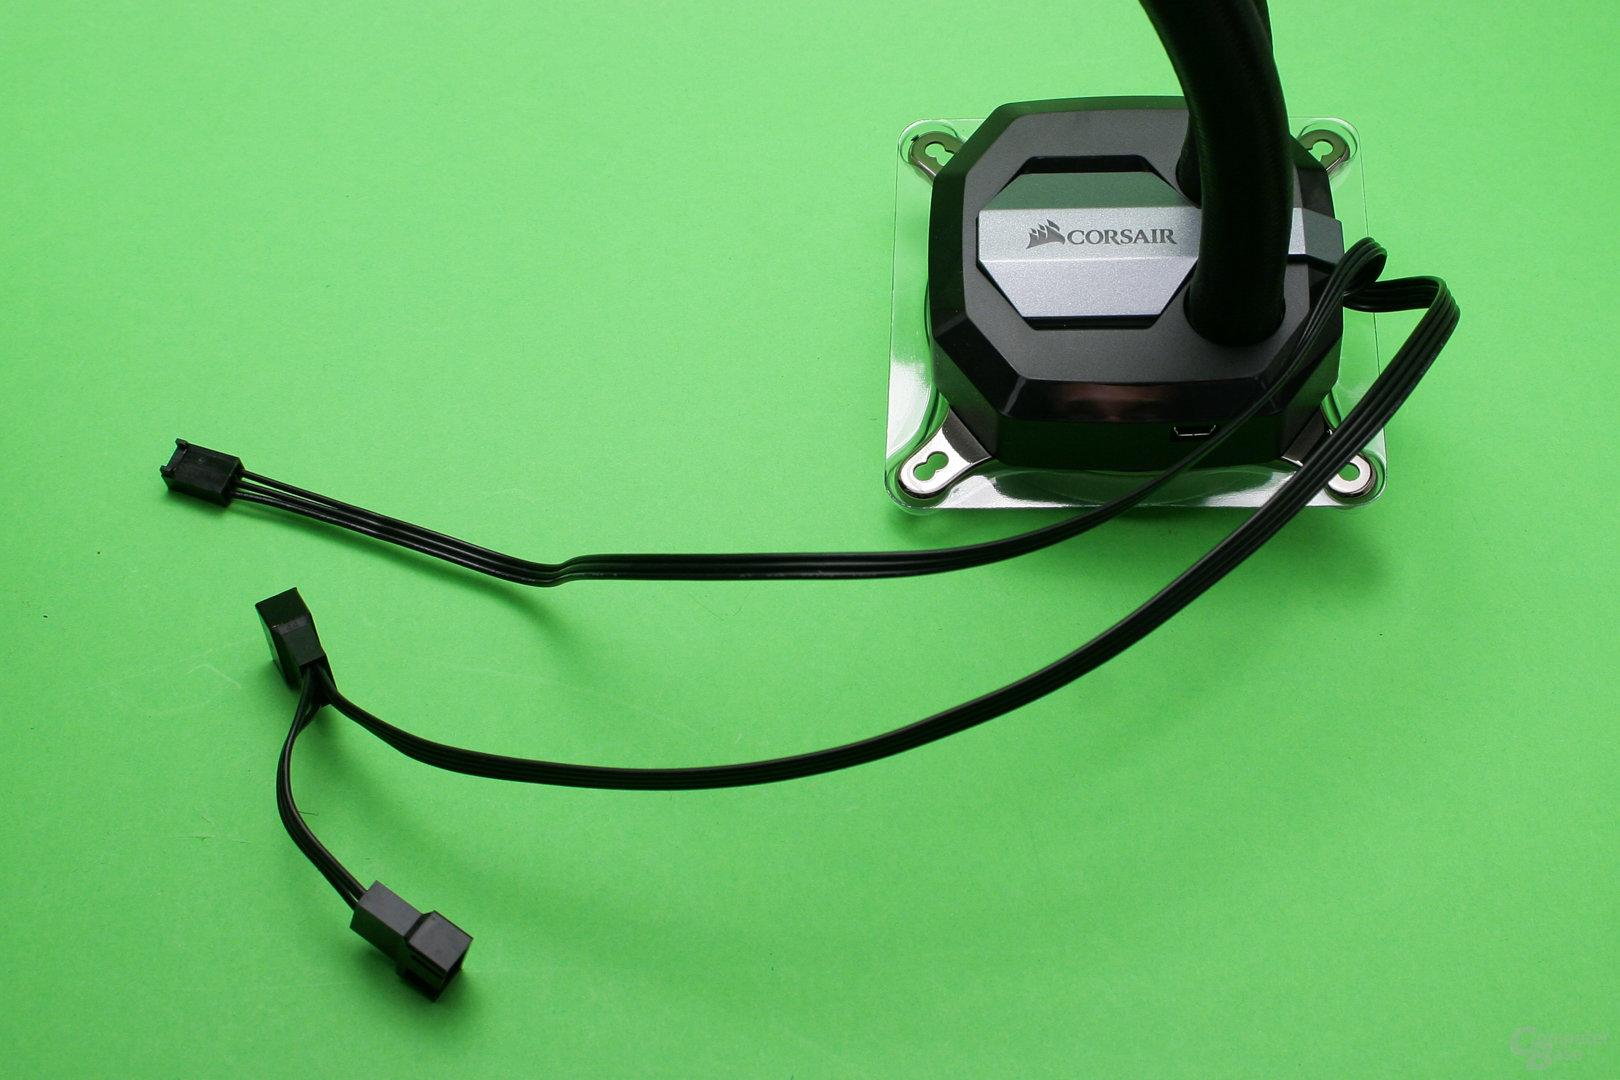 Corsair H100i v2: Die Pumpeneinheit kann Lüfter steuern